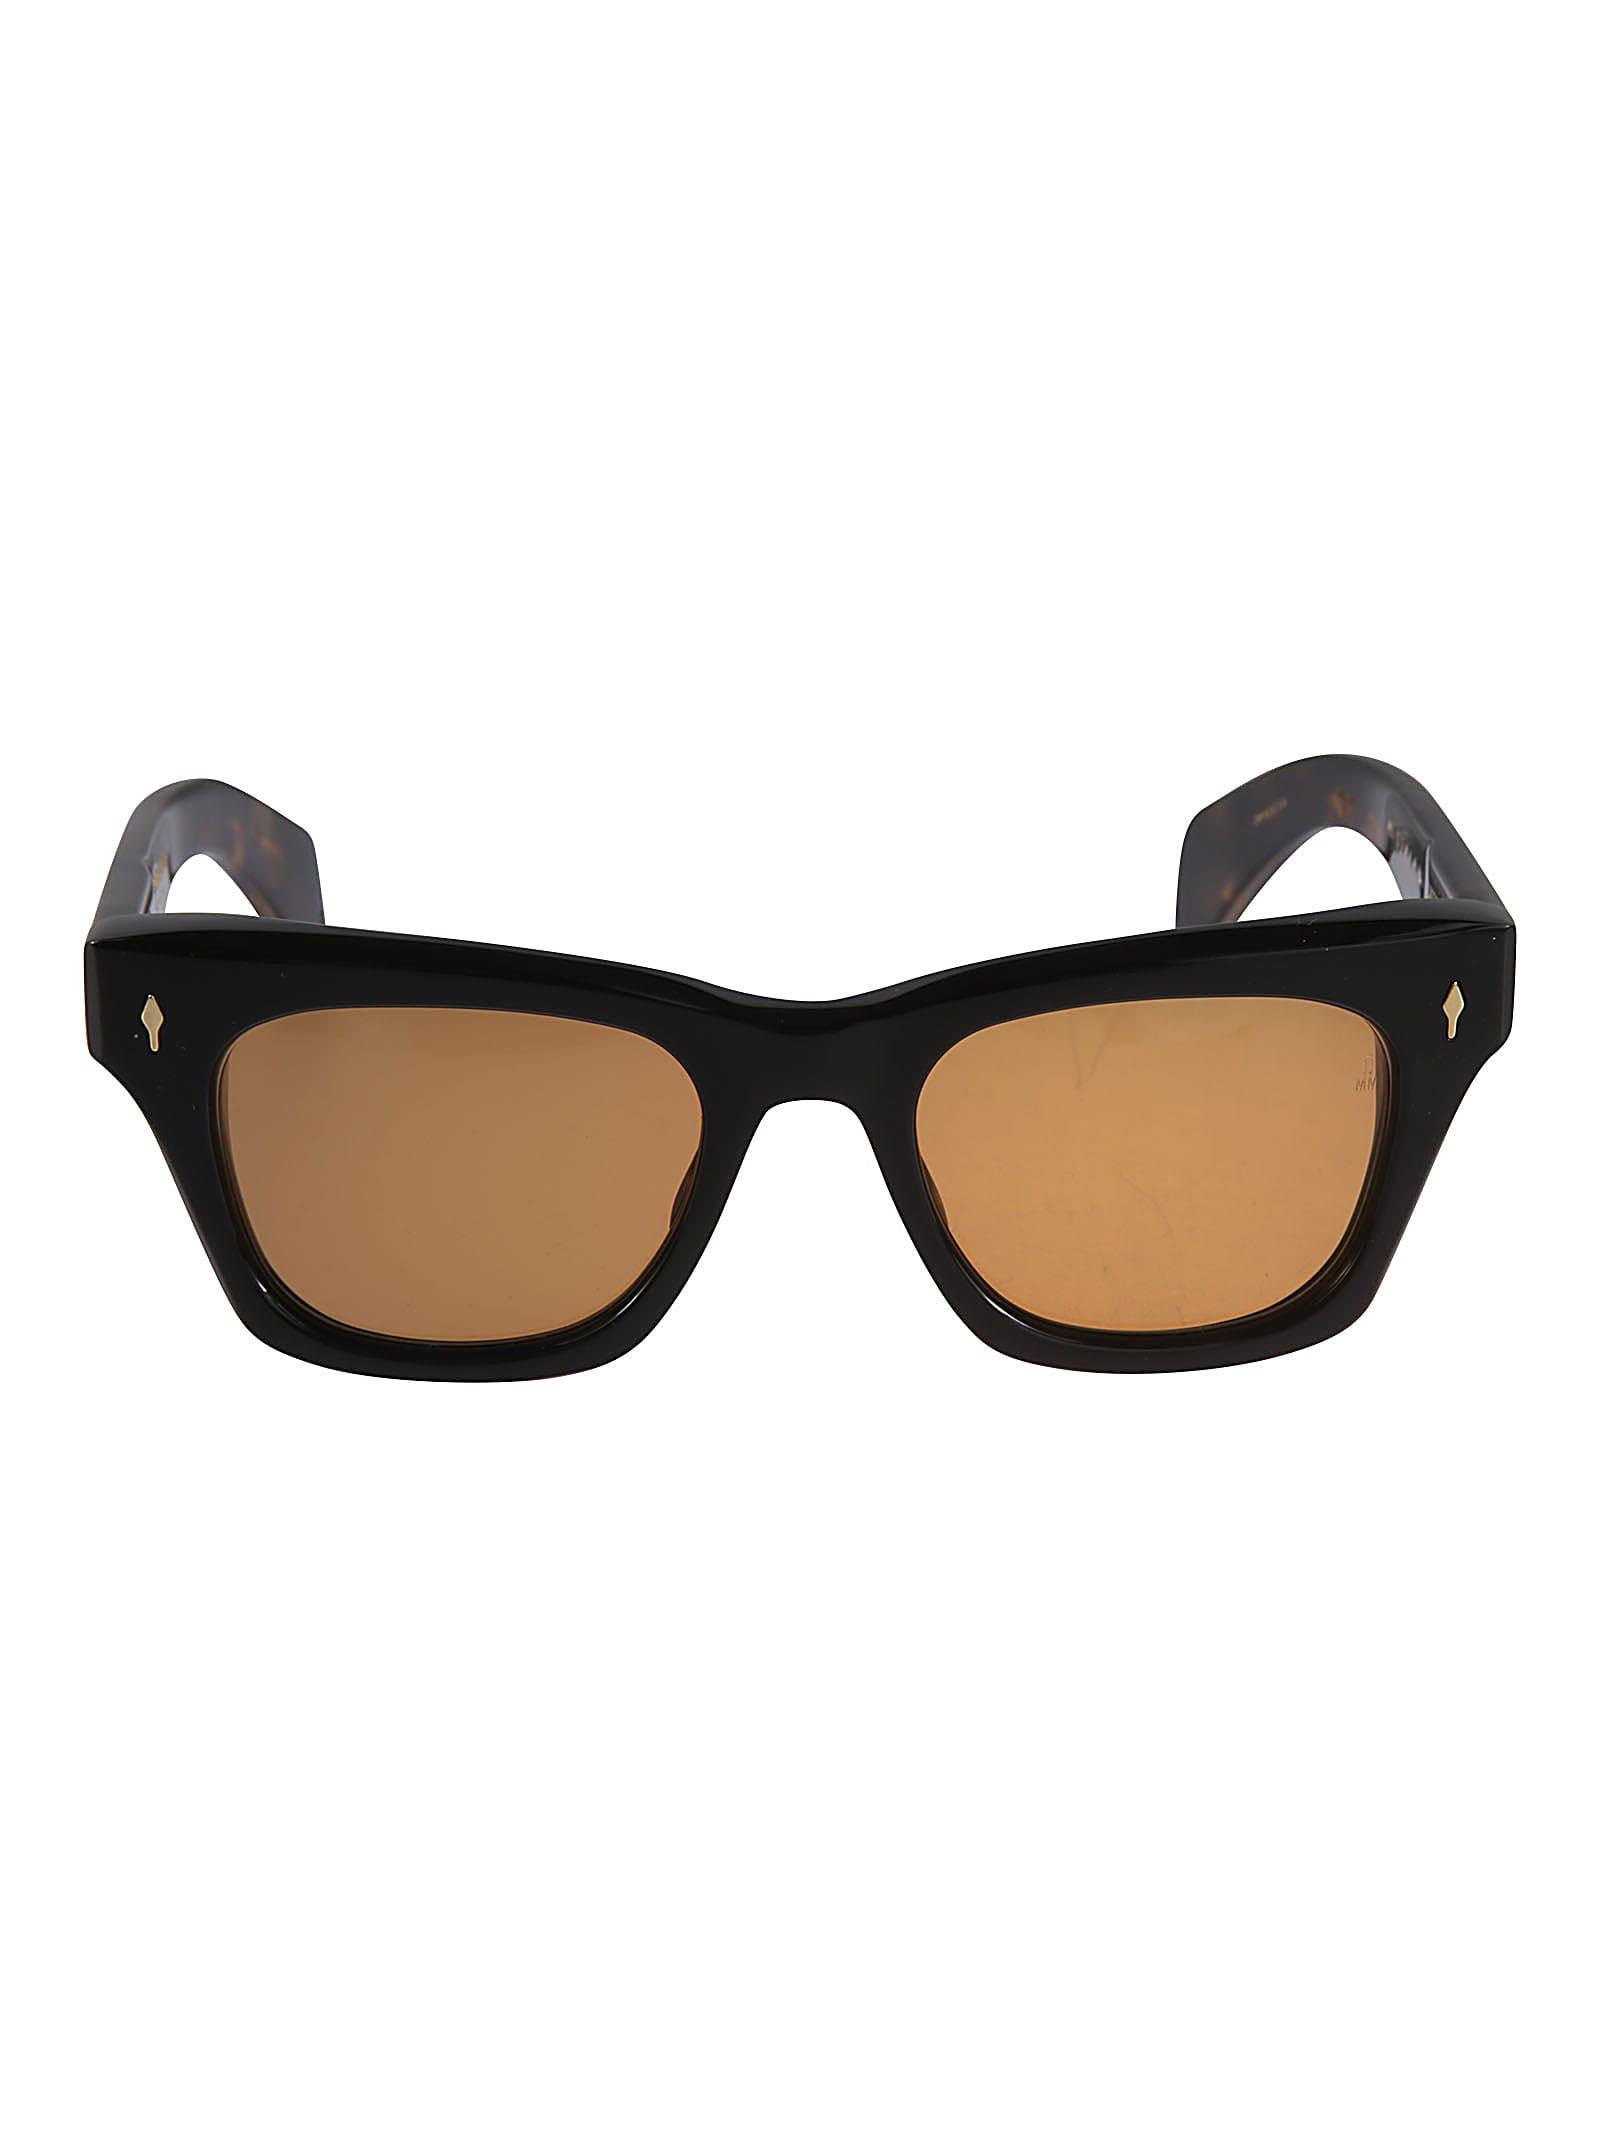 Logo Detail Tinted Sunglasses